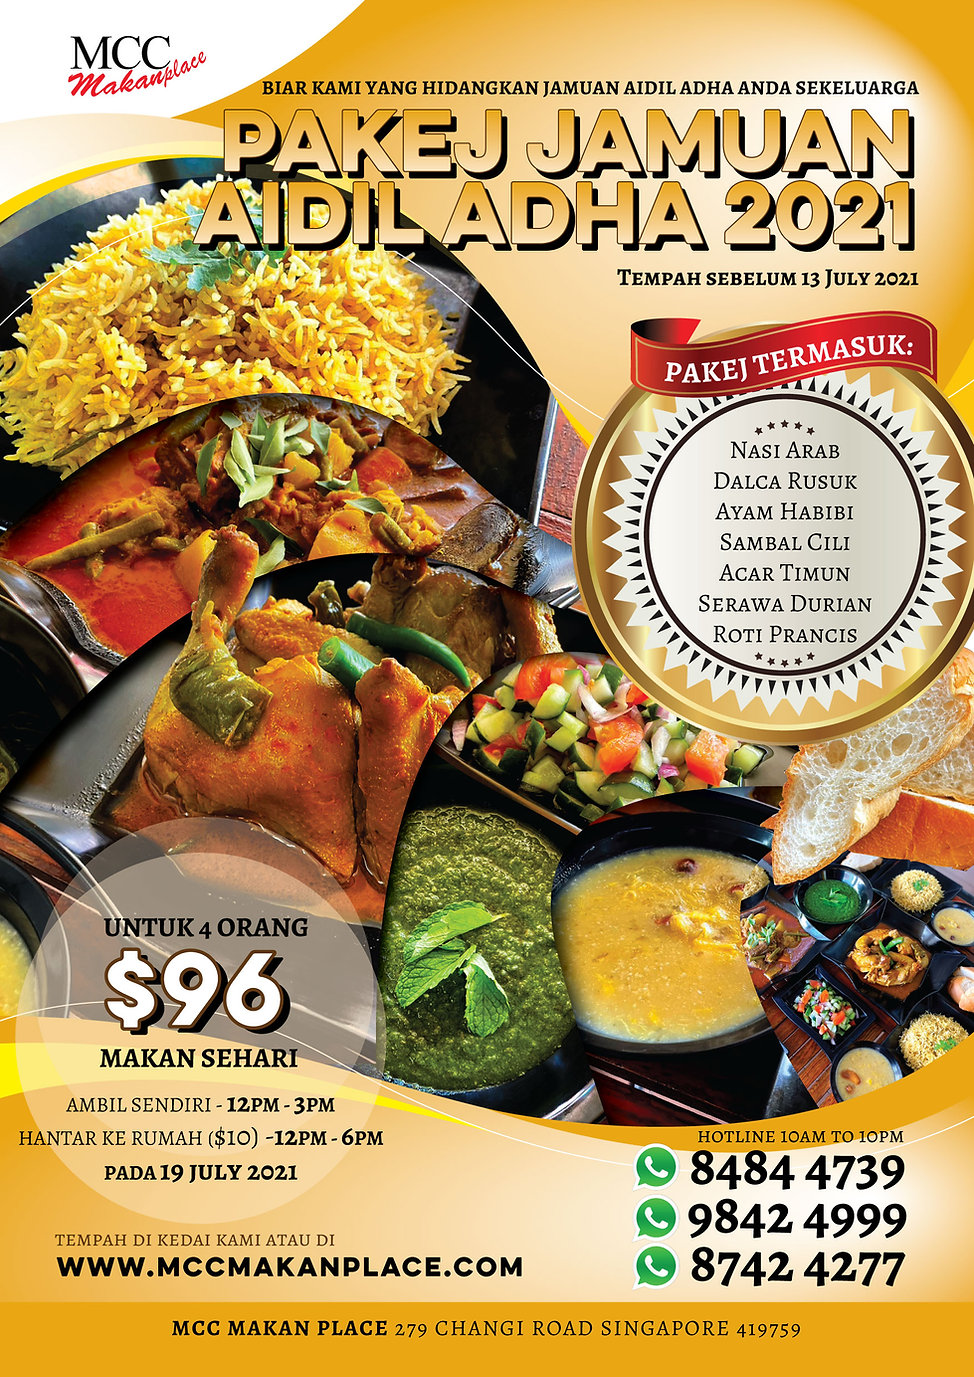 Pakej Jamuan Haji 2021 - A3 Poster Optim